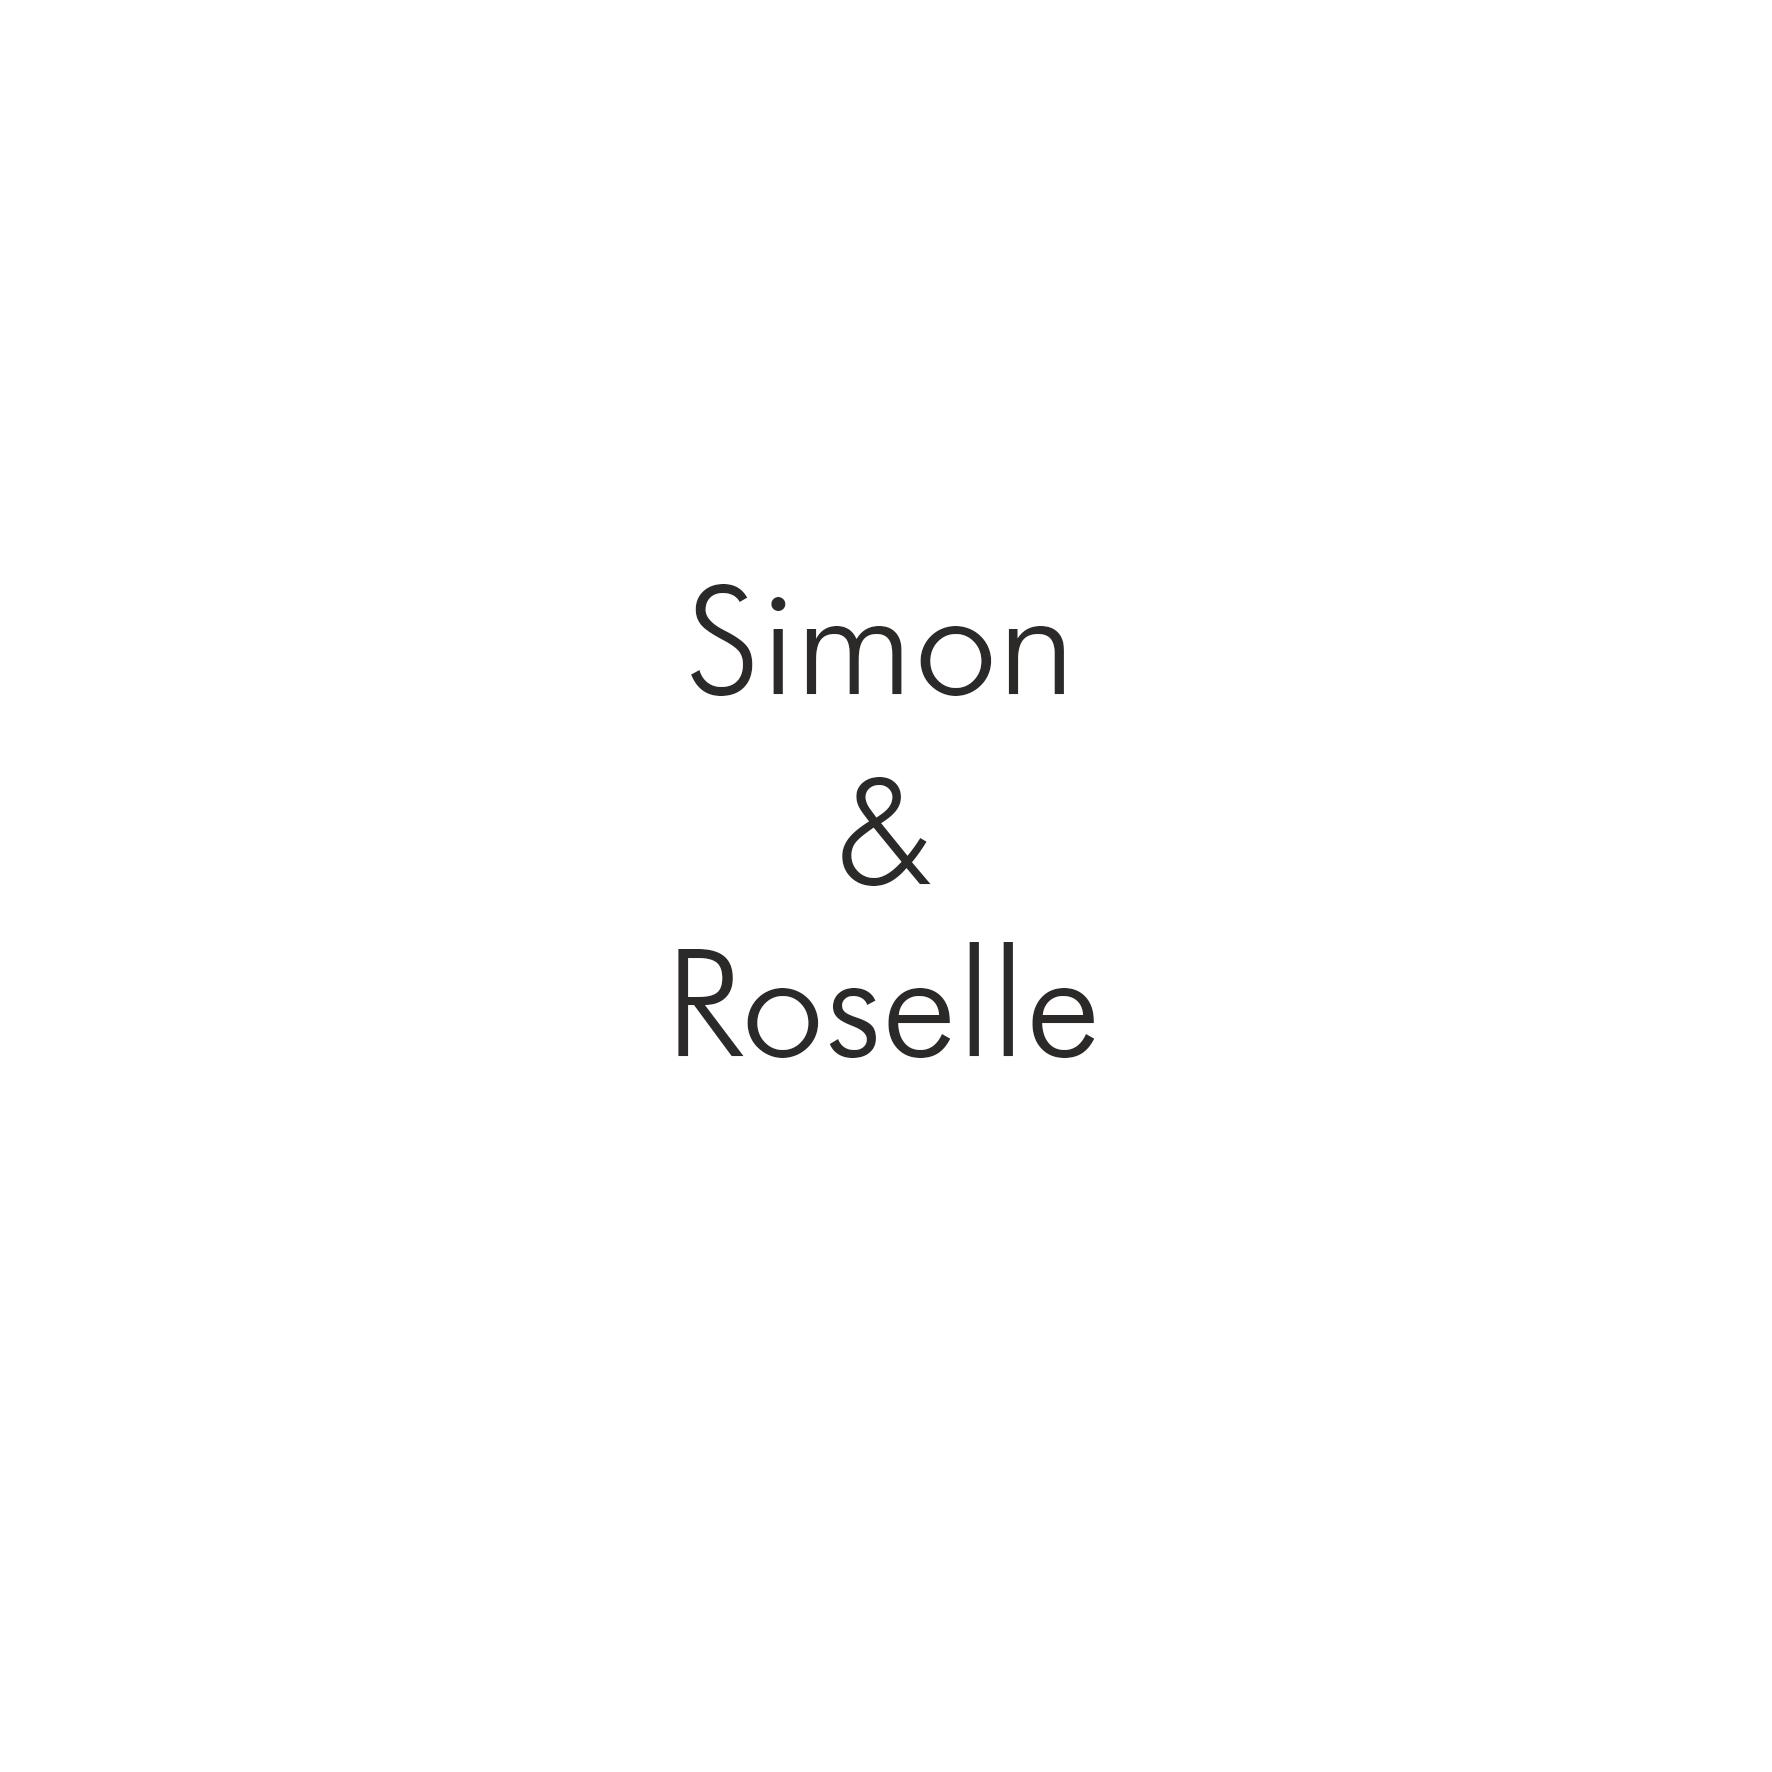 Simon & Roselle.png